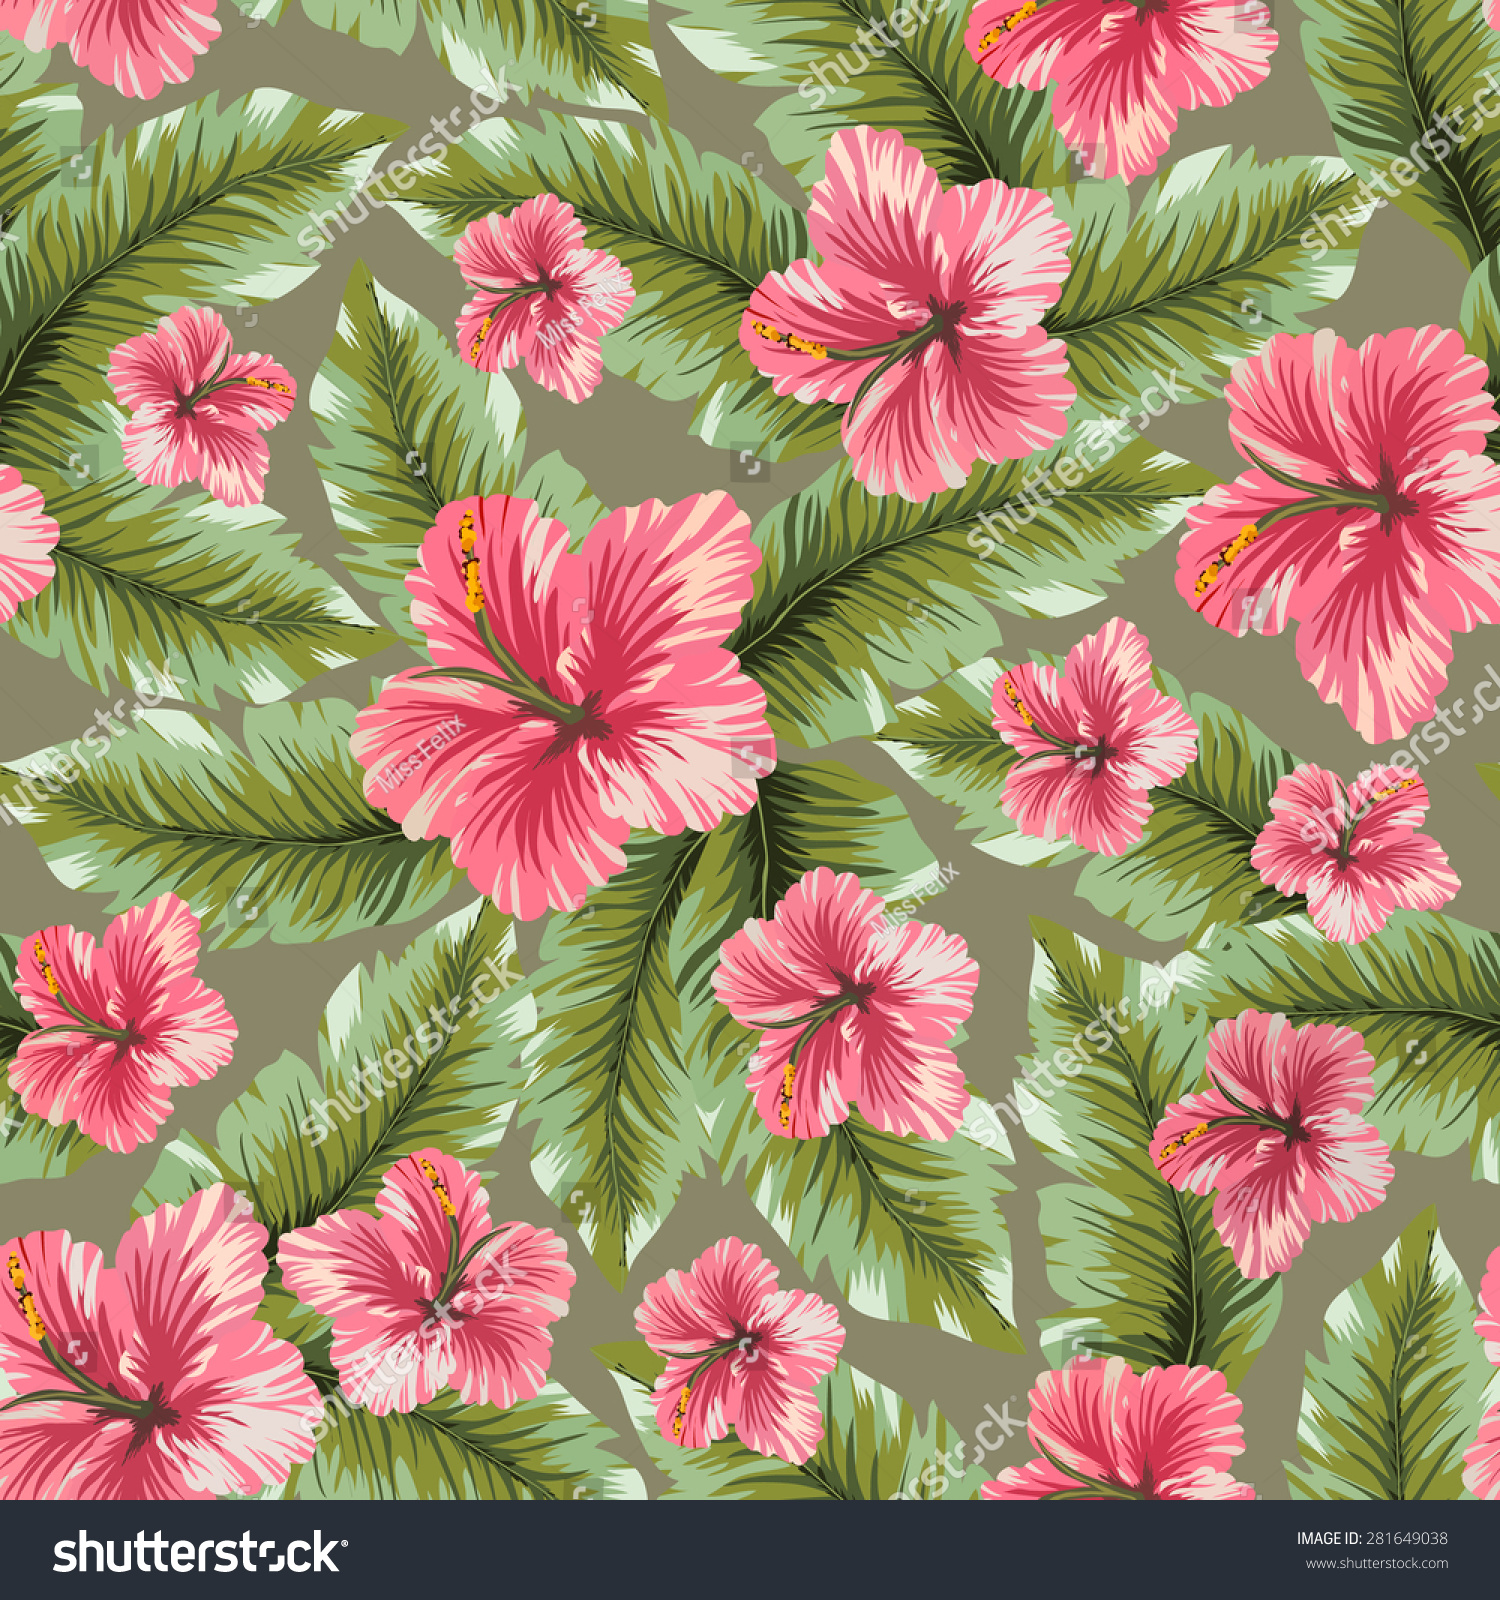 Vector seamless hawaiian flower pattern background stock vector vector seamless hawaiian flower pattern background hibiscus flowers and palm trees leaves seamless texture izmirmasajfo